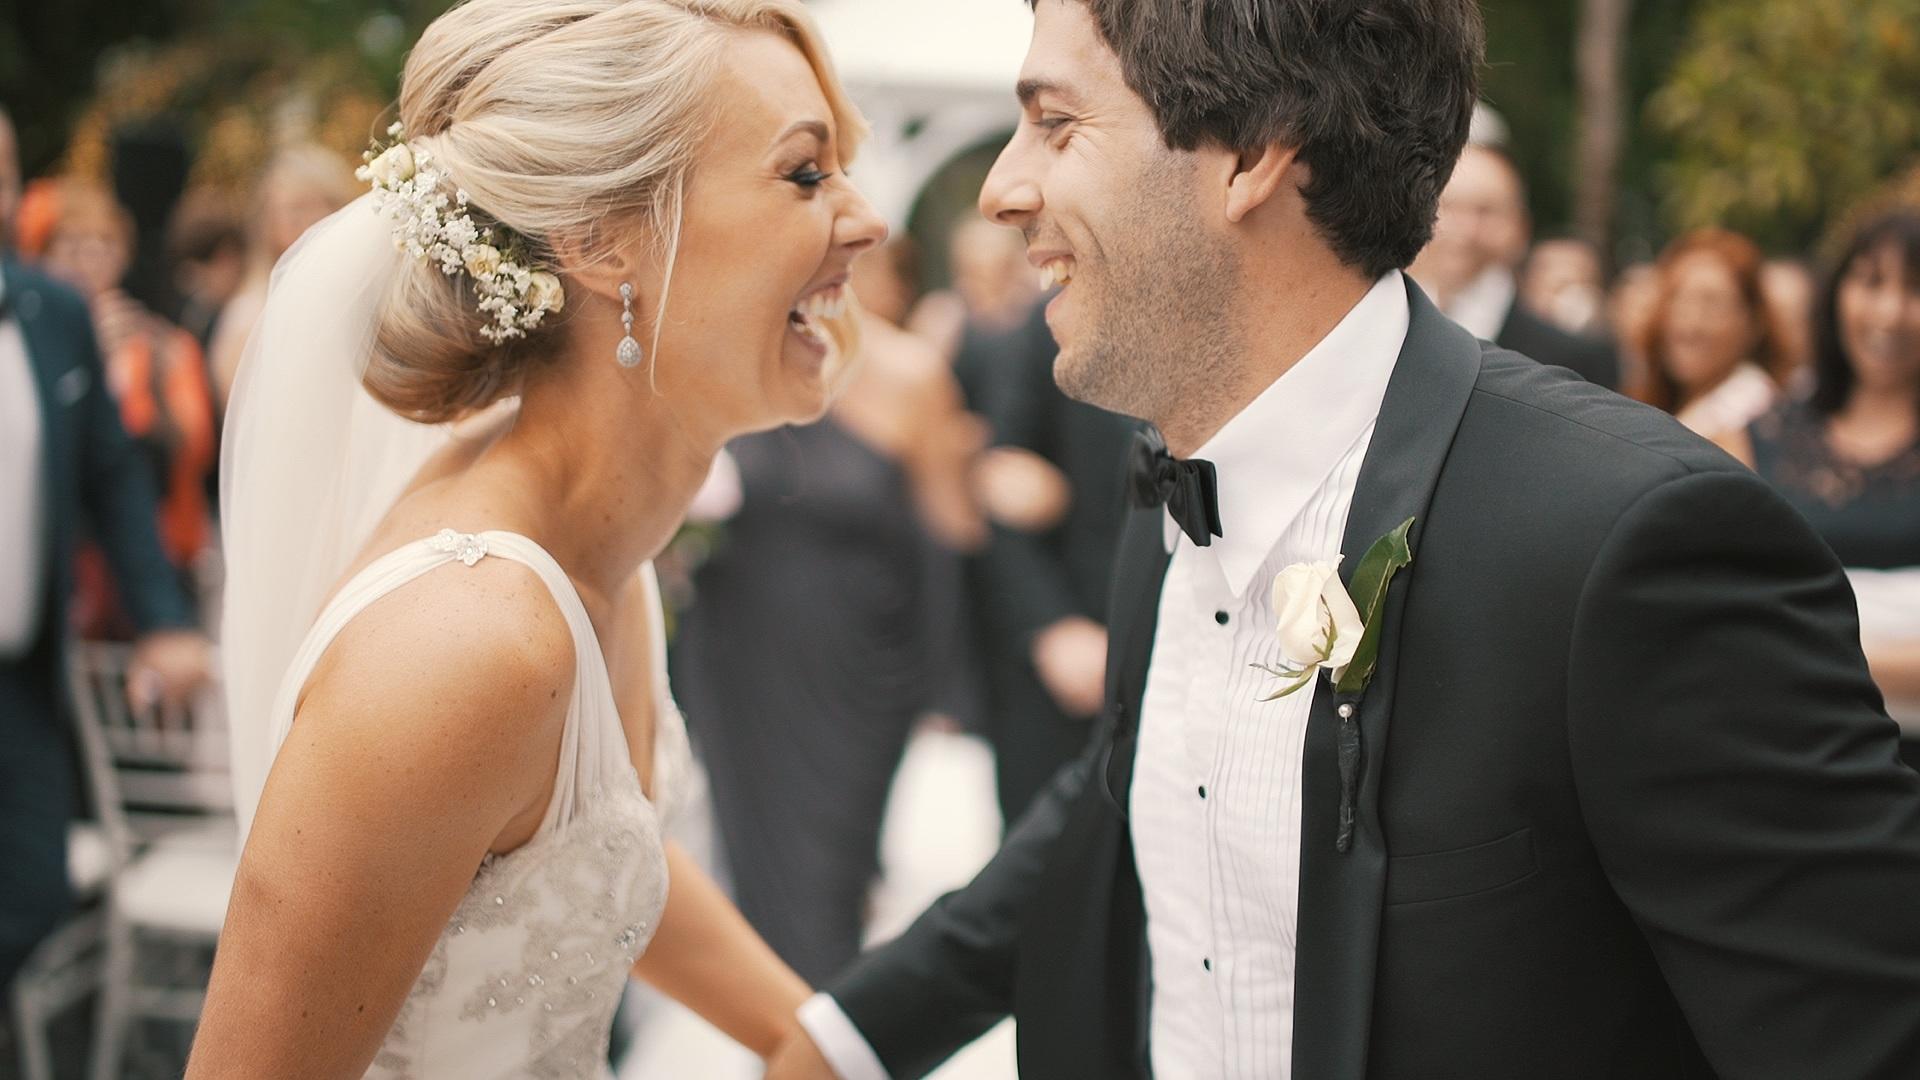 картинки свадеб мужчины иностранцы